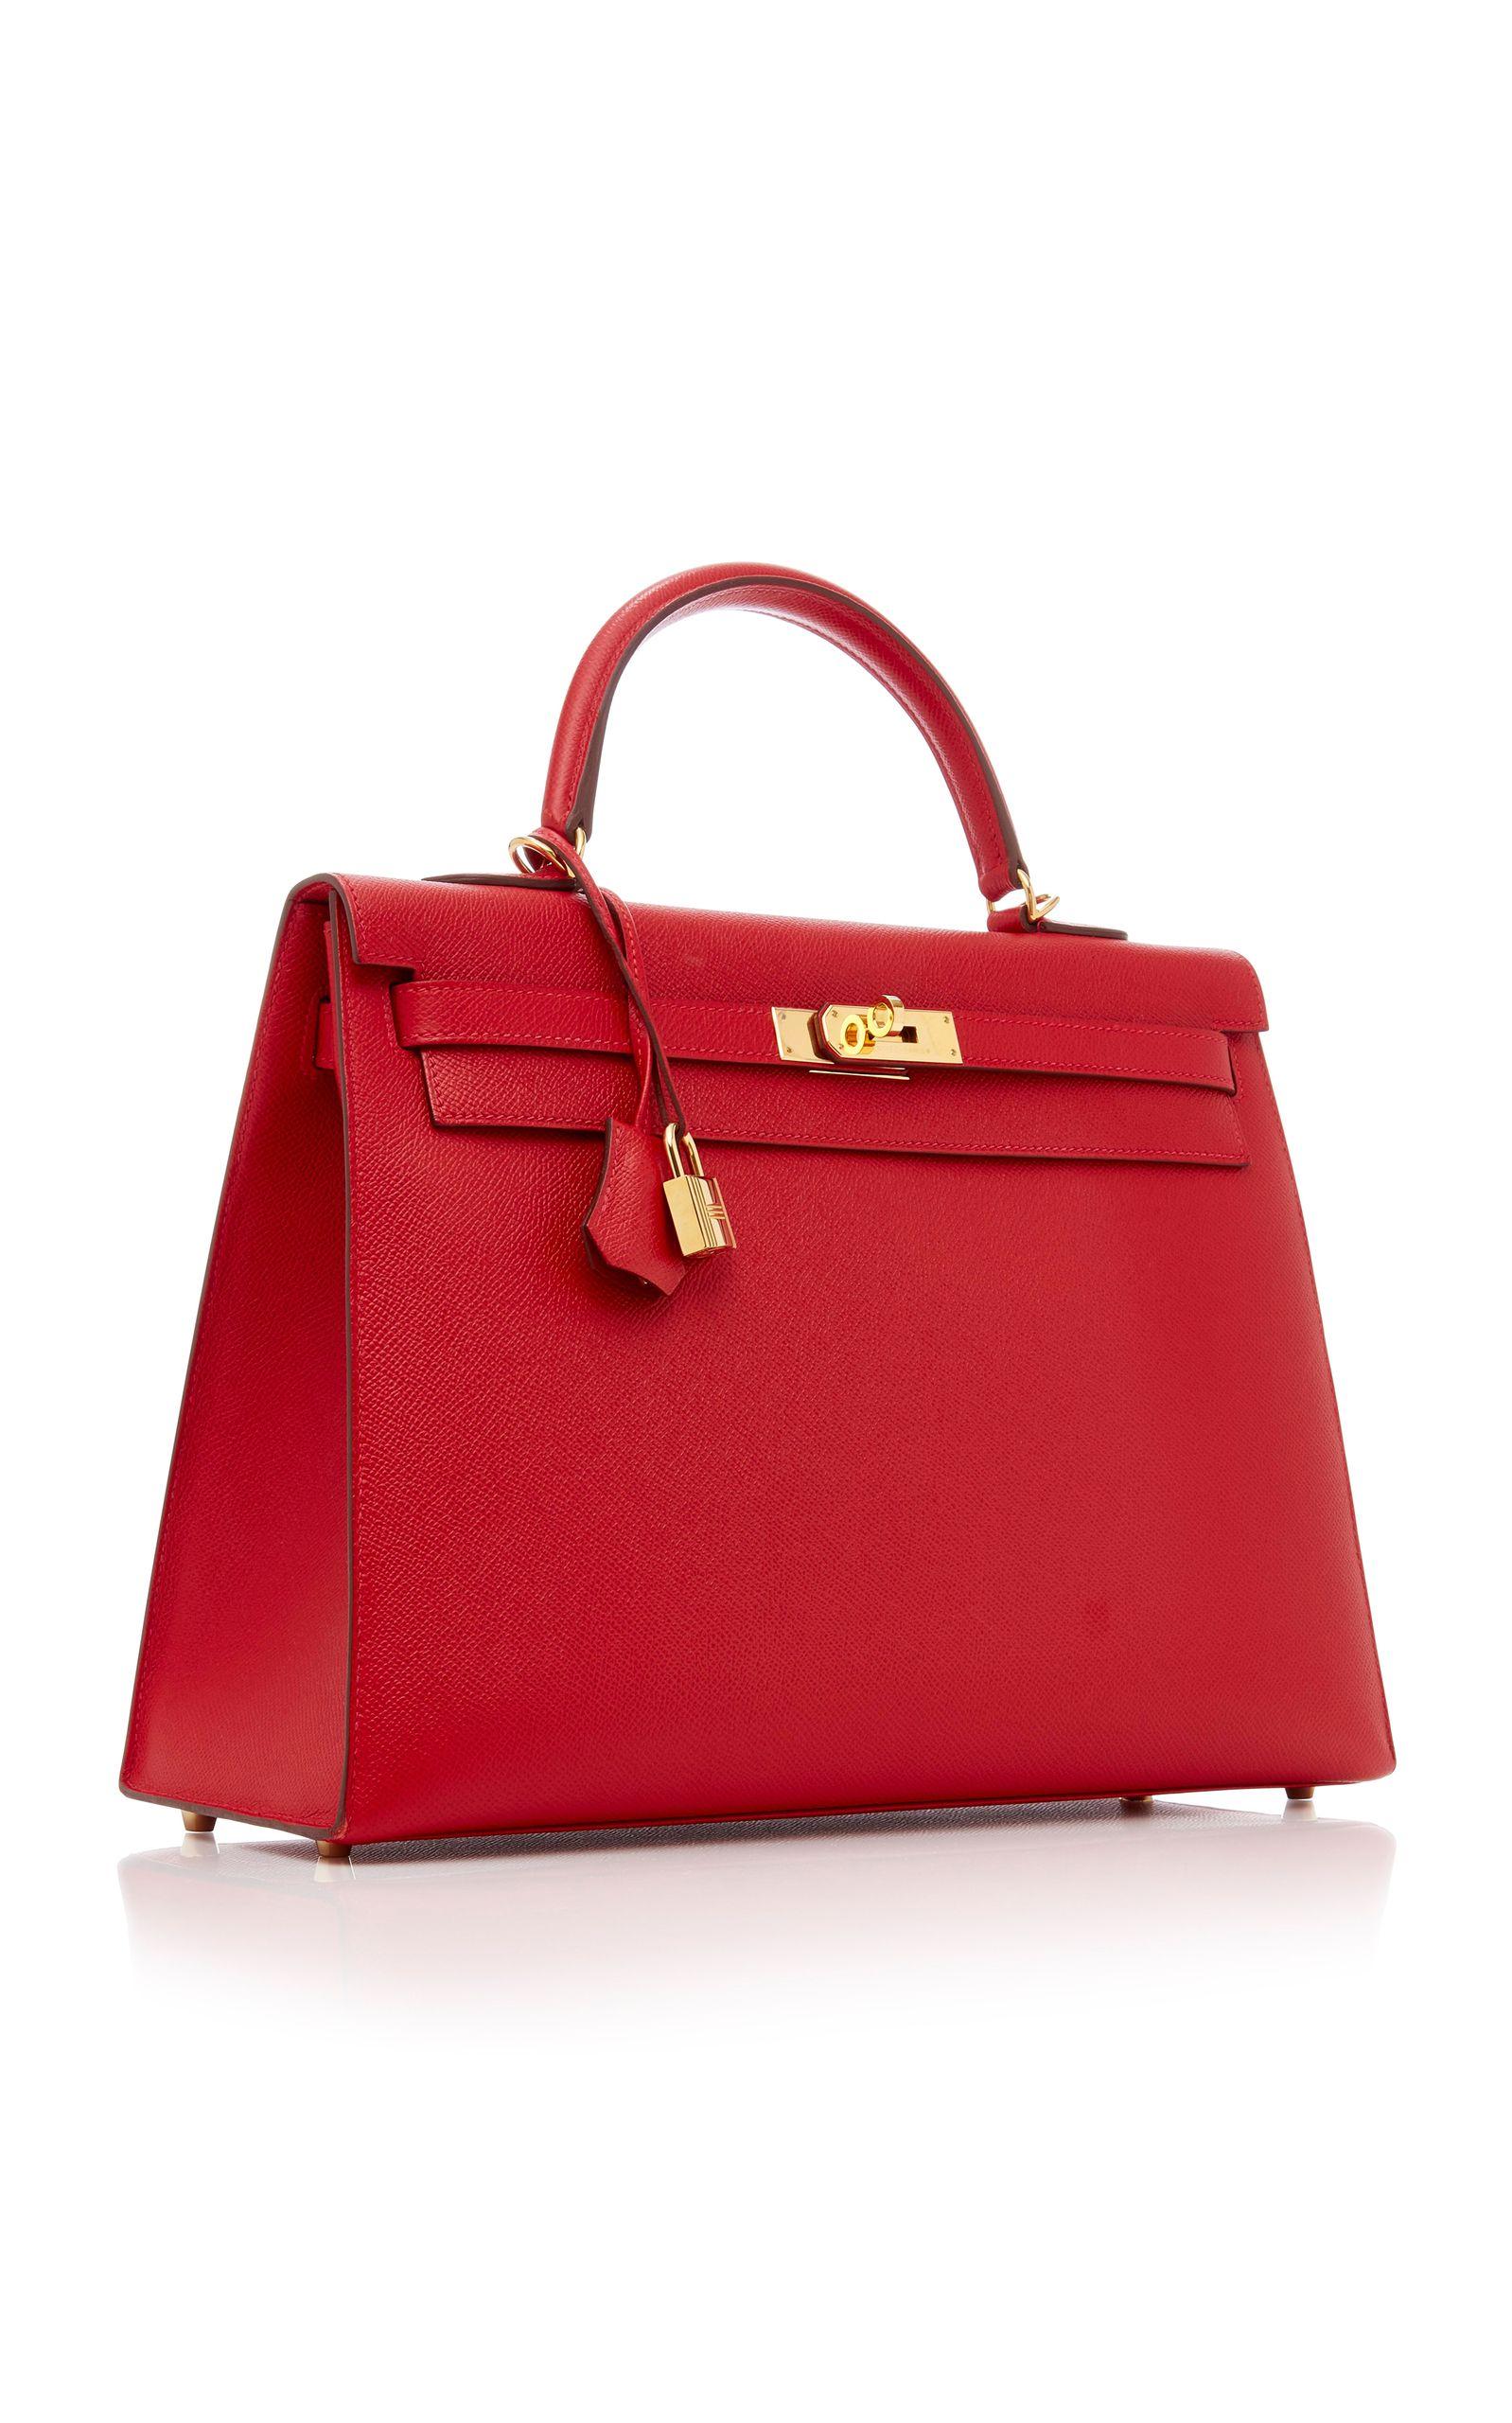 d5d6967fb0 Hermes 35Cm Rouge Casaques Epsom Leather Kelly | bags | Bags, Hermes ...